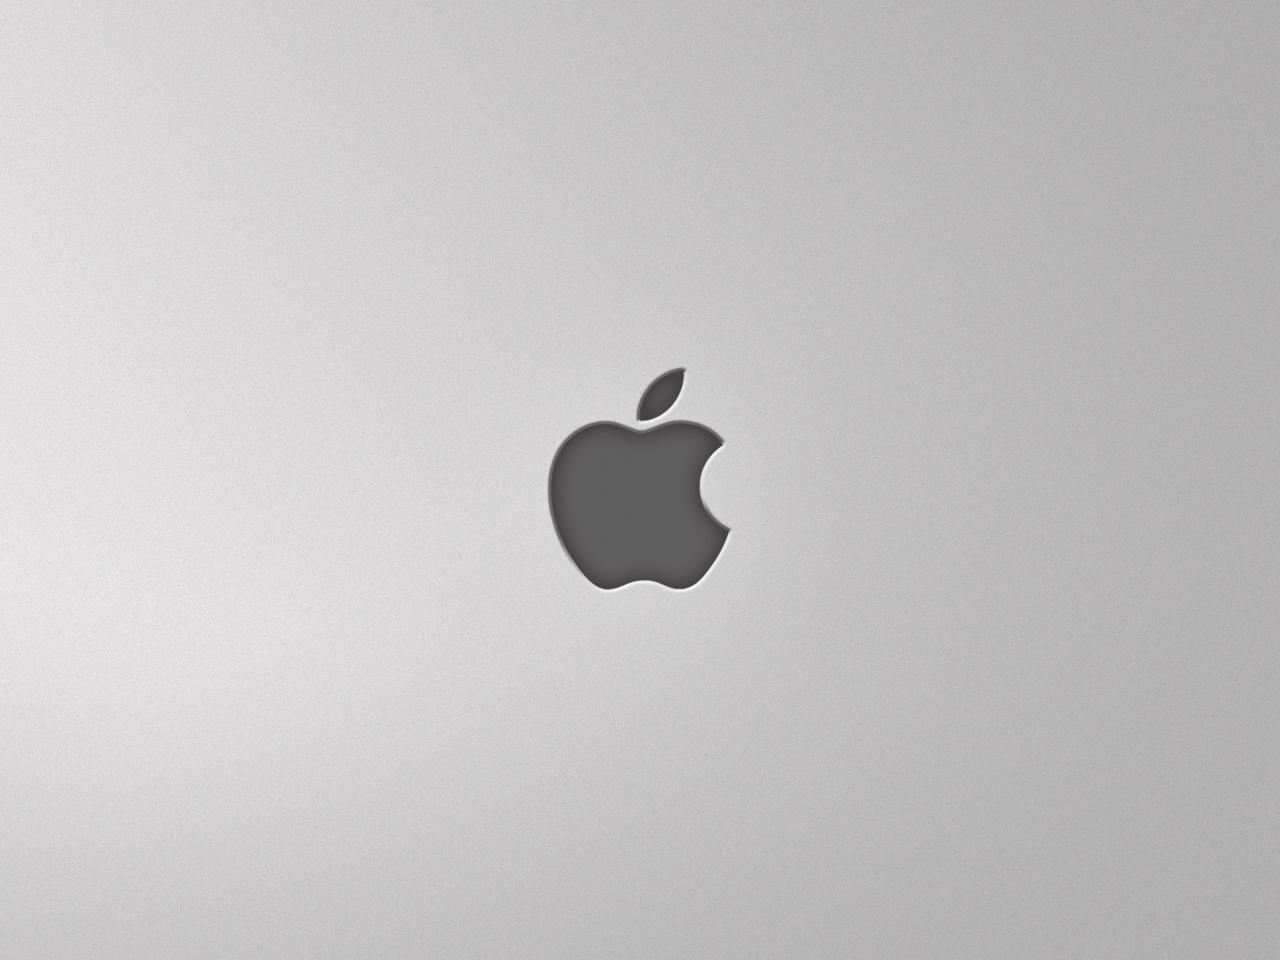 Logo de Apple - 1280x960